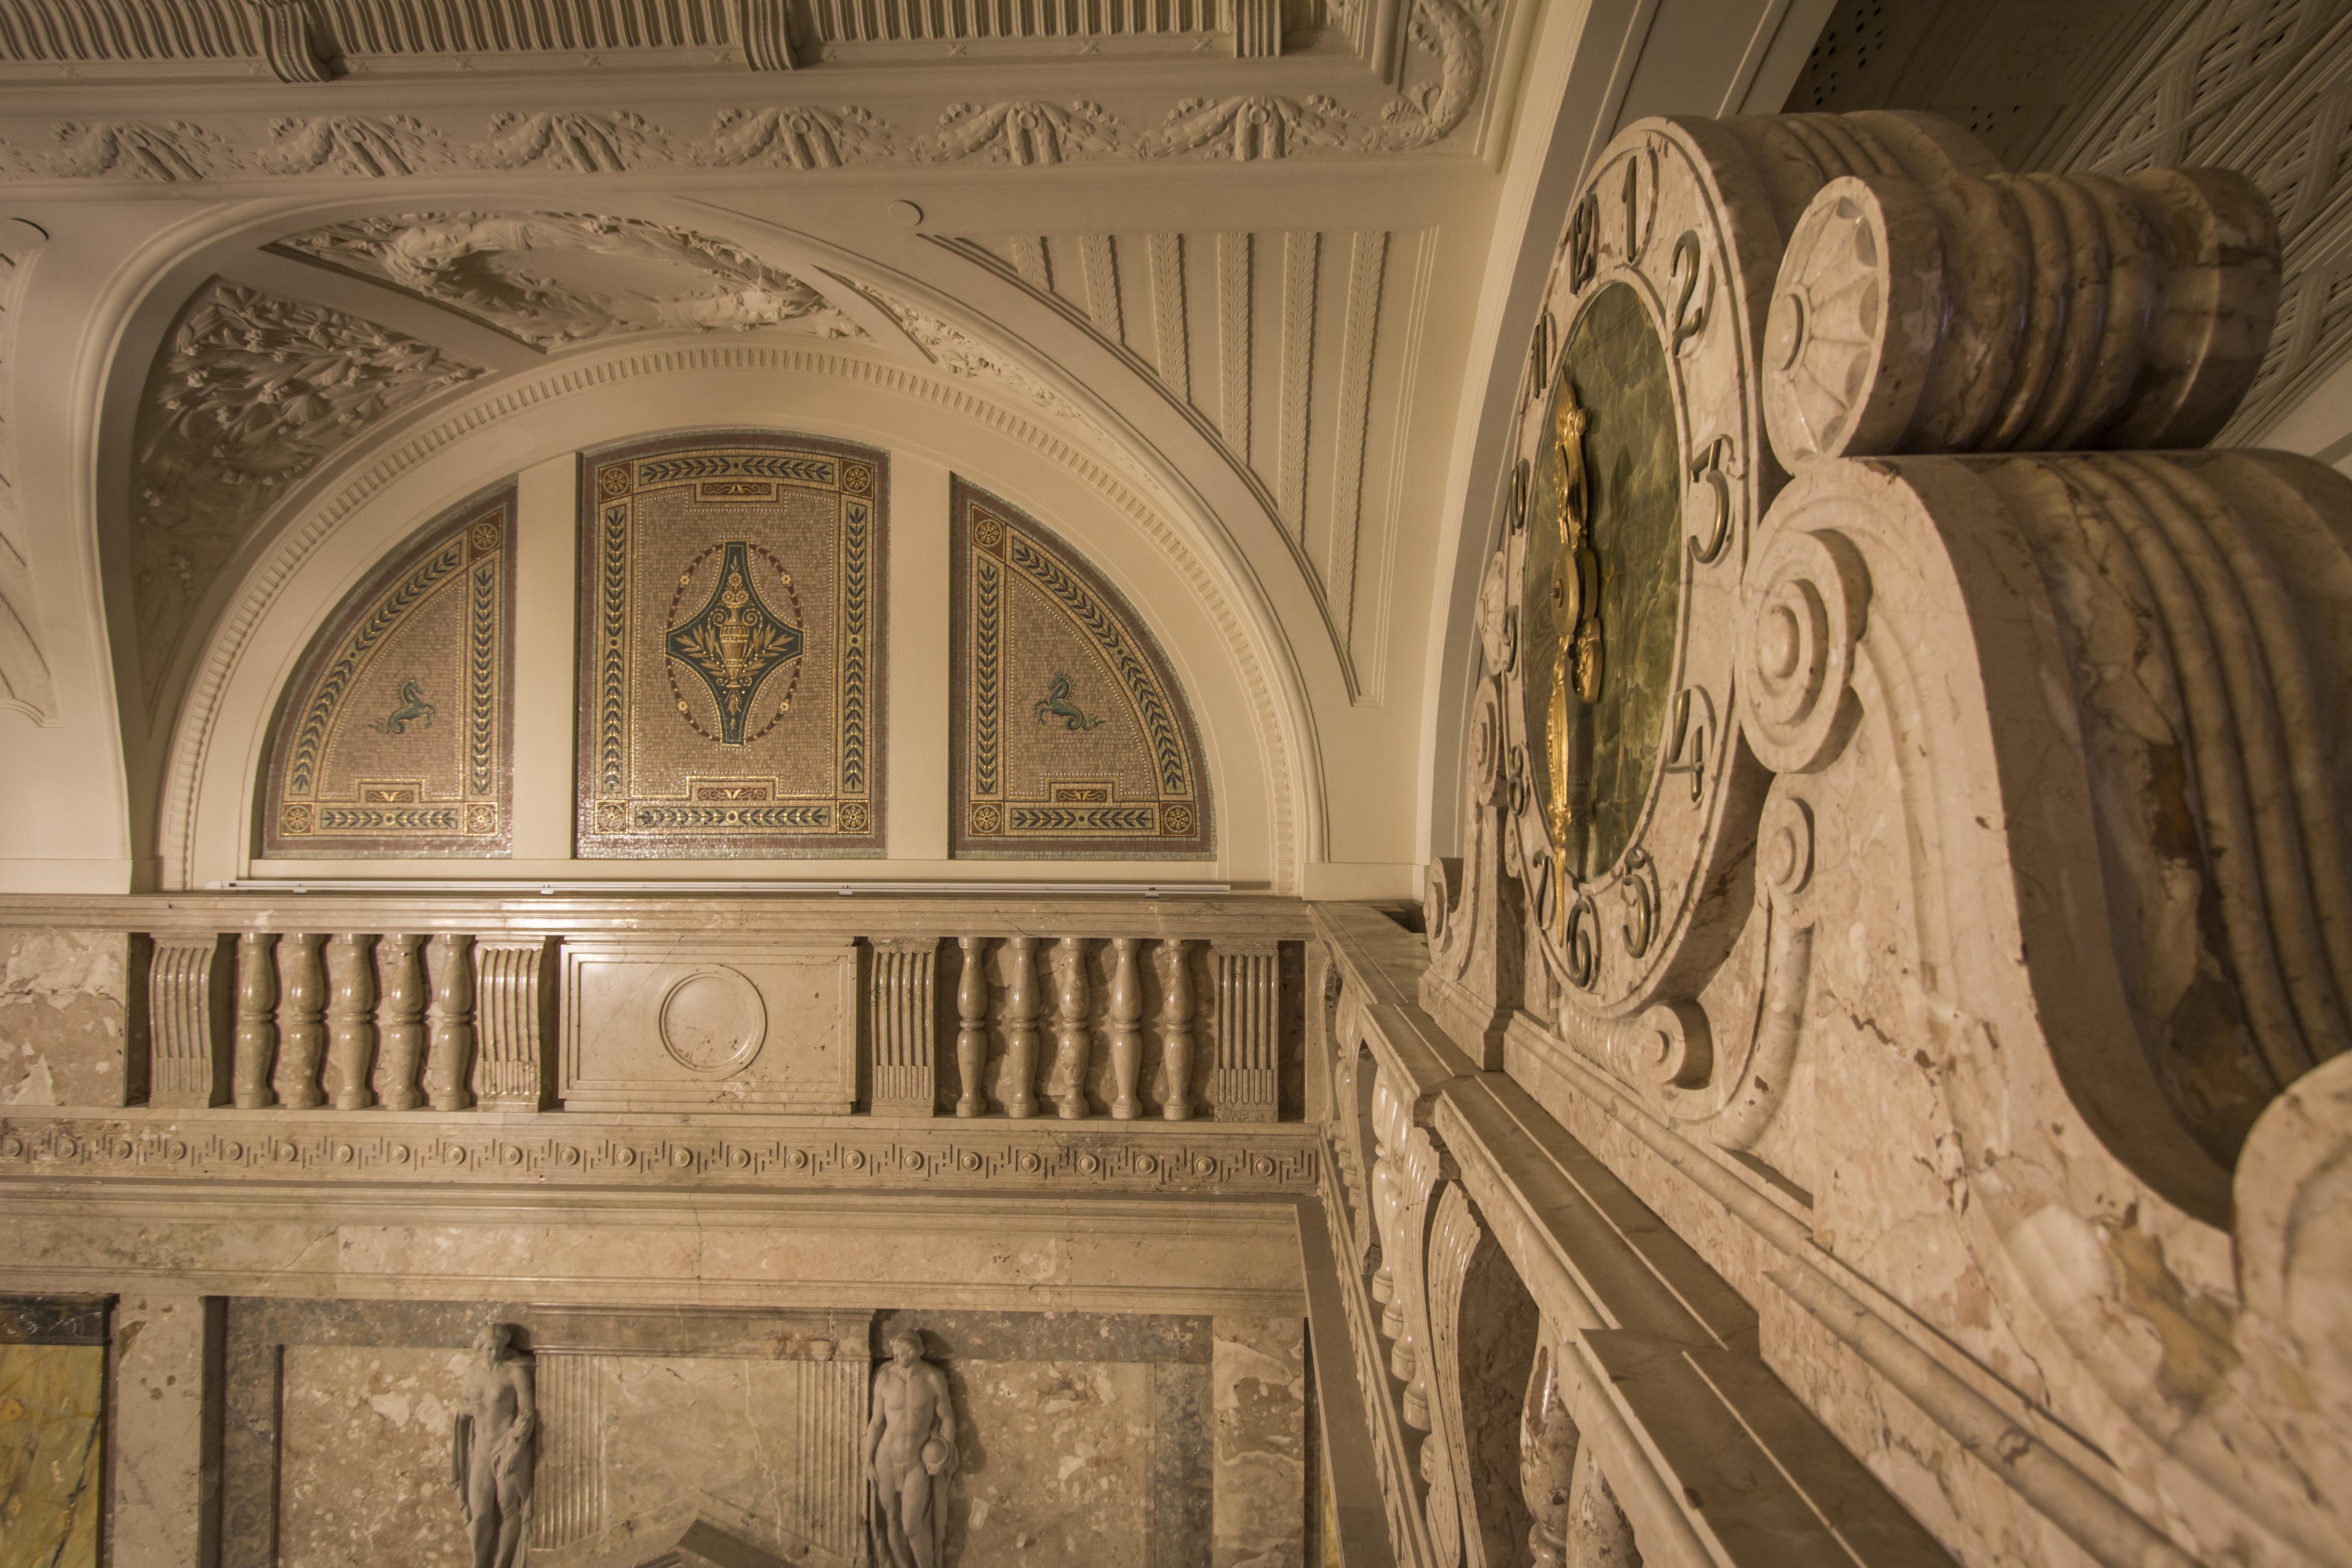 6._marble_clock_and_mosaics_heritage_interior_vaci1_budapest_hungary